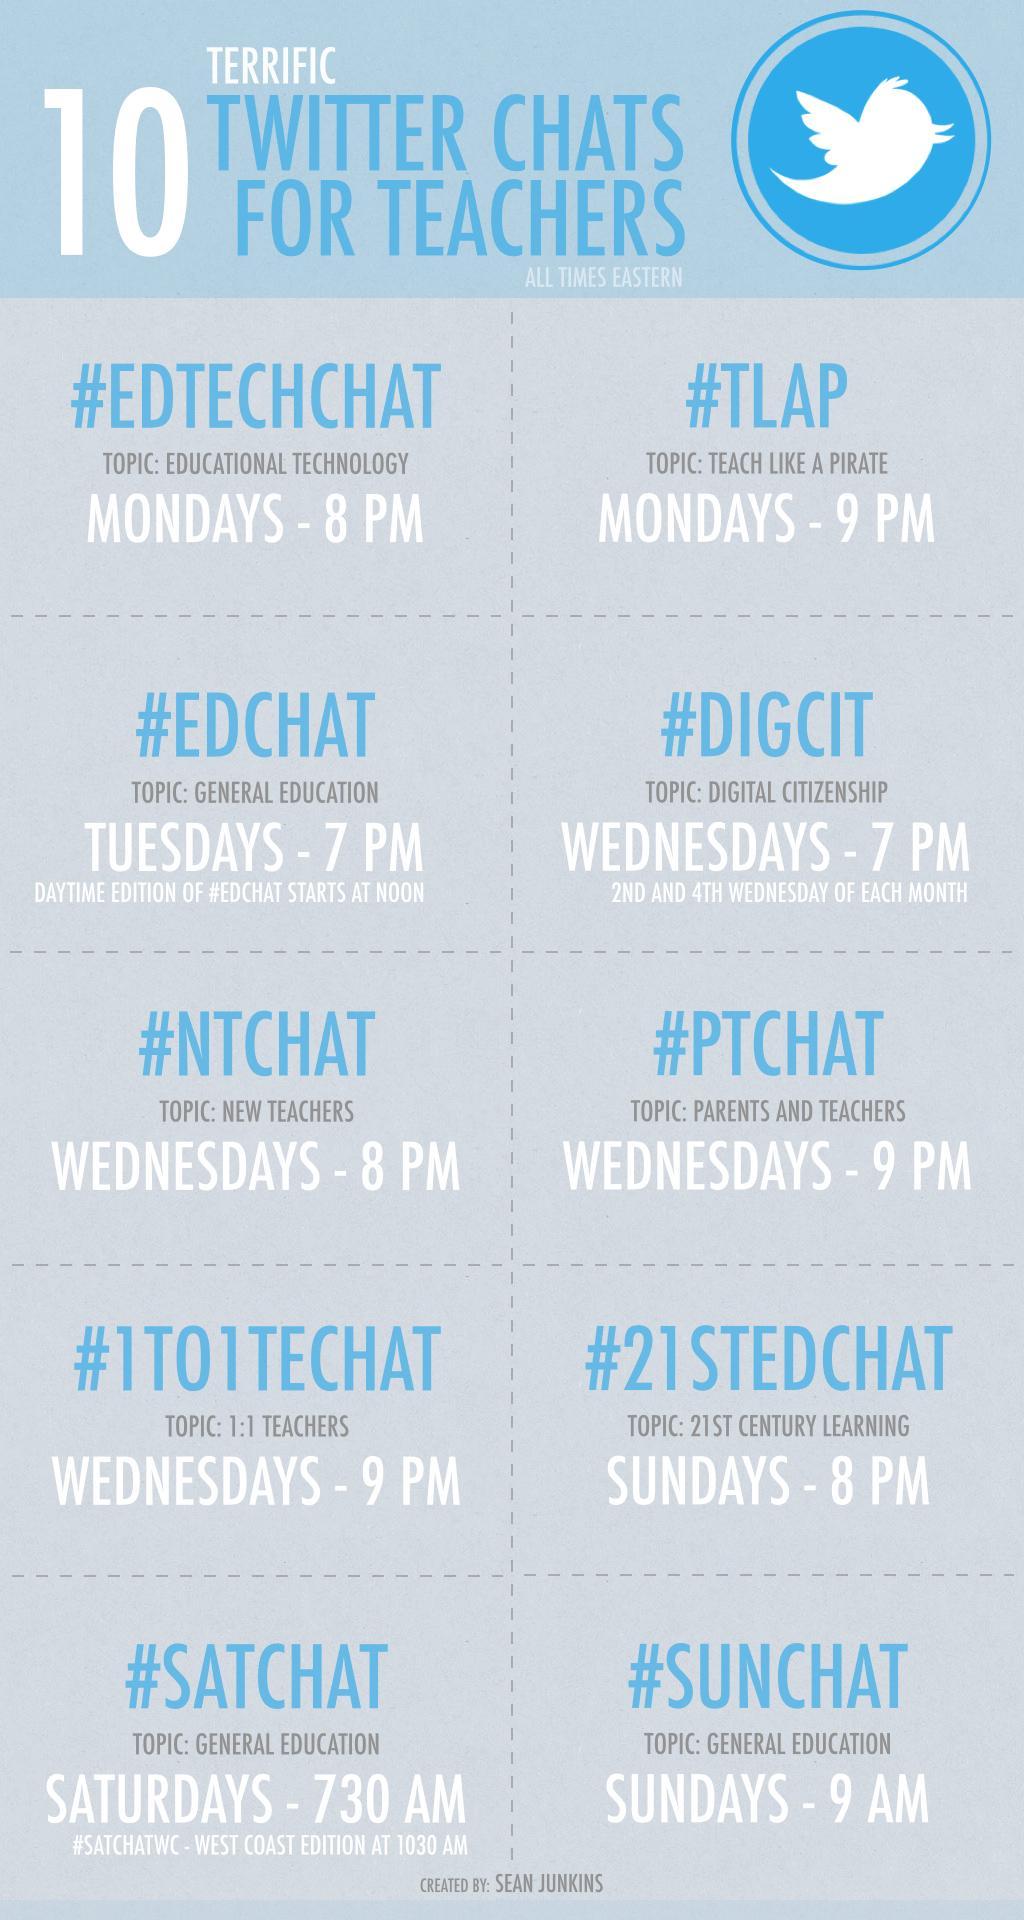 Twitter / sjunkins: 10 Terrific Twitter Chats for ...